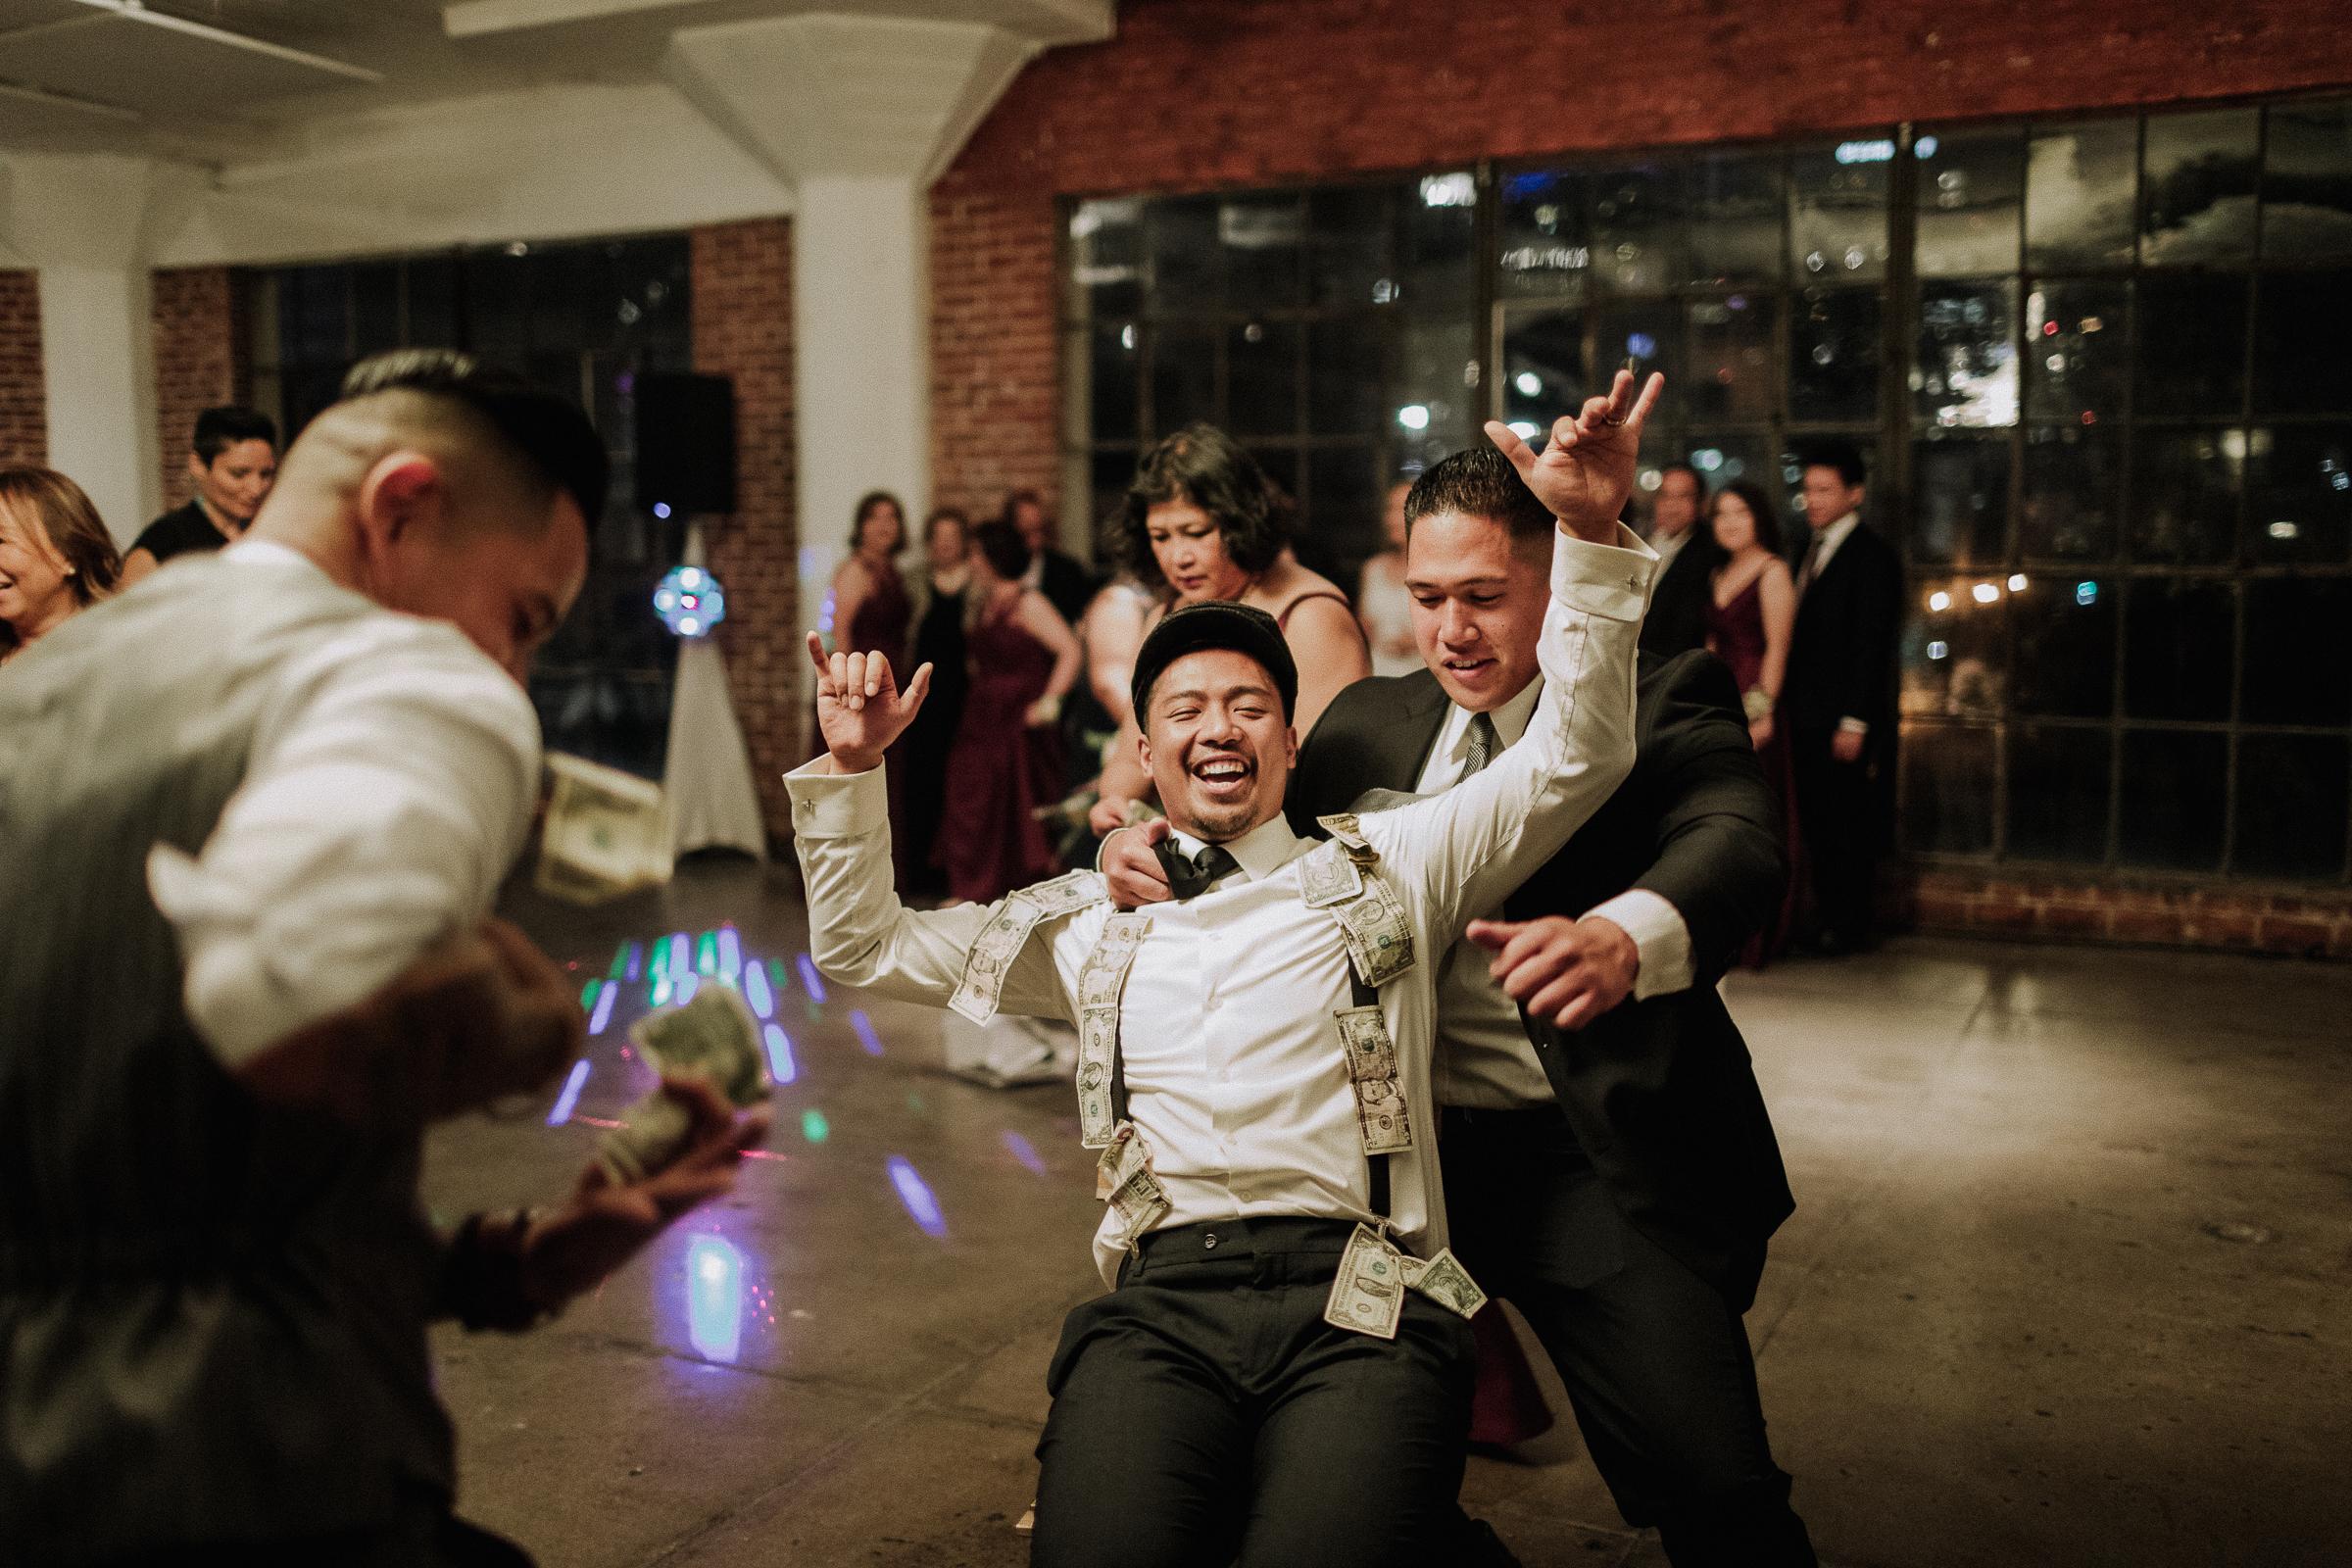 Gretchen Gause Photography | Los Angeles Hudson Loft Wedding #hudsonloft #laweddingphotographer #DTLA #weddingplanning #romanticwedding #rooftopwedding #weddingphotography #weddingdress #moneydance